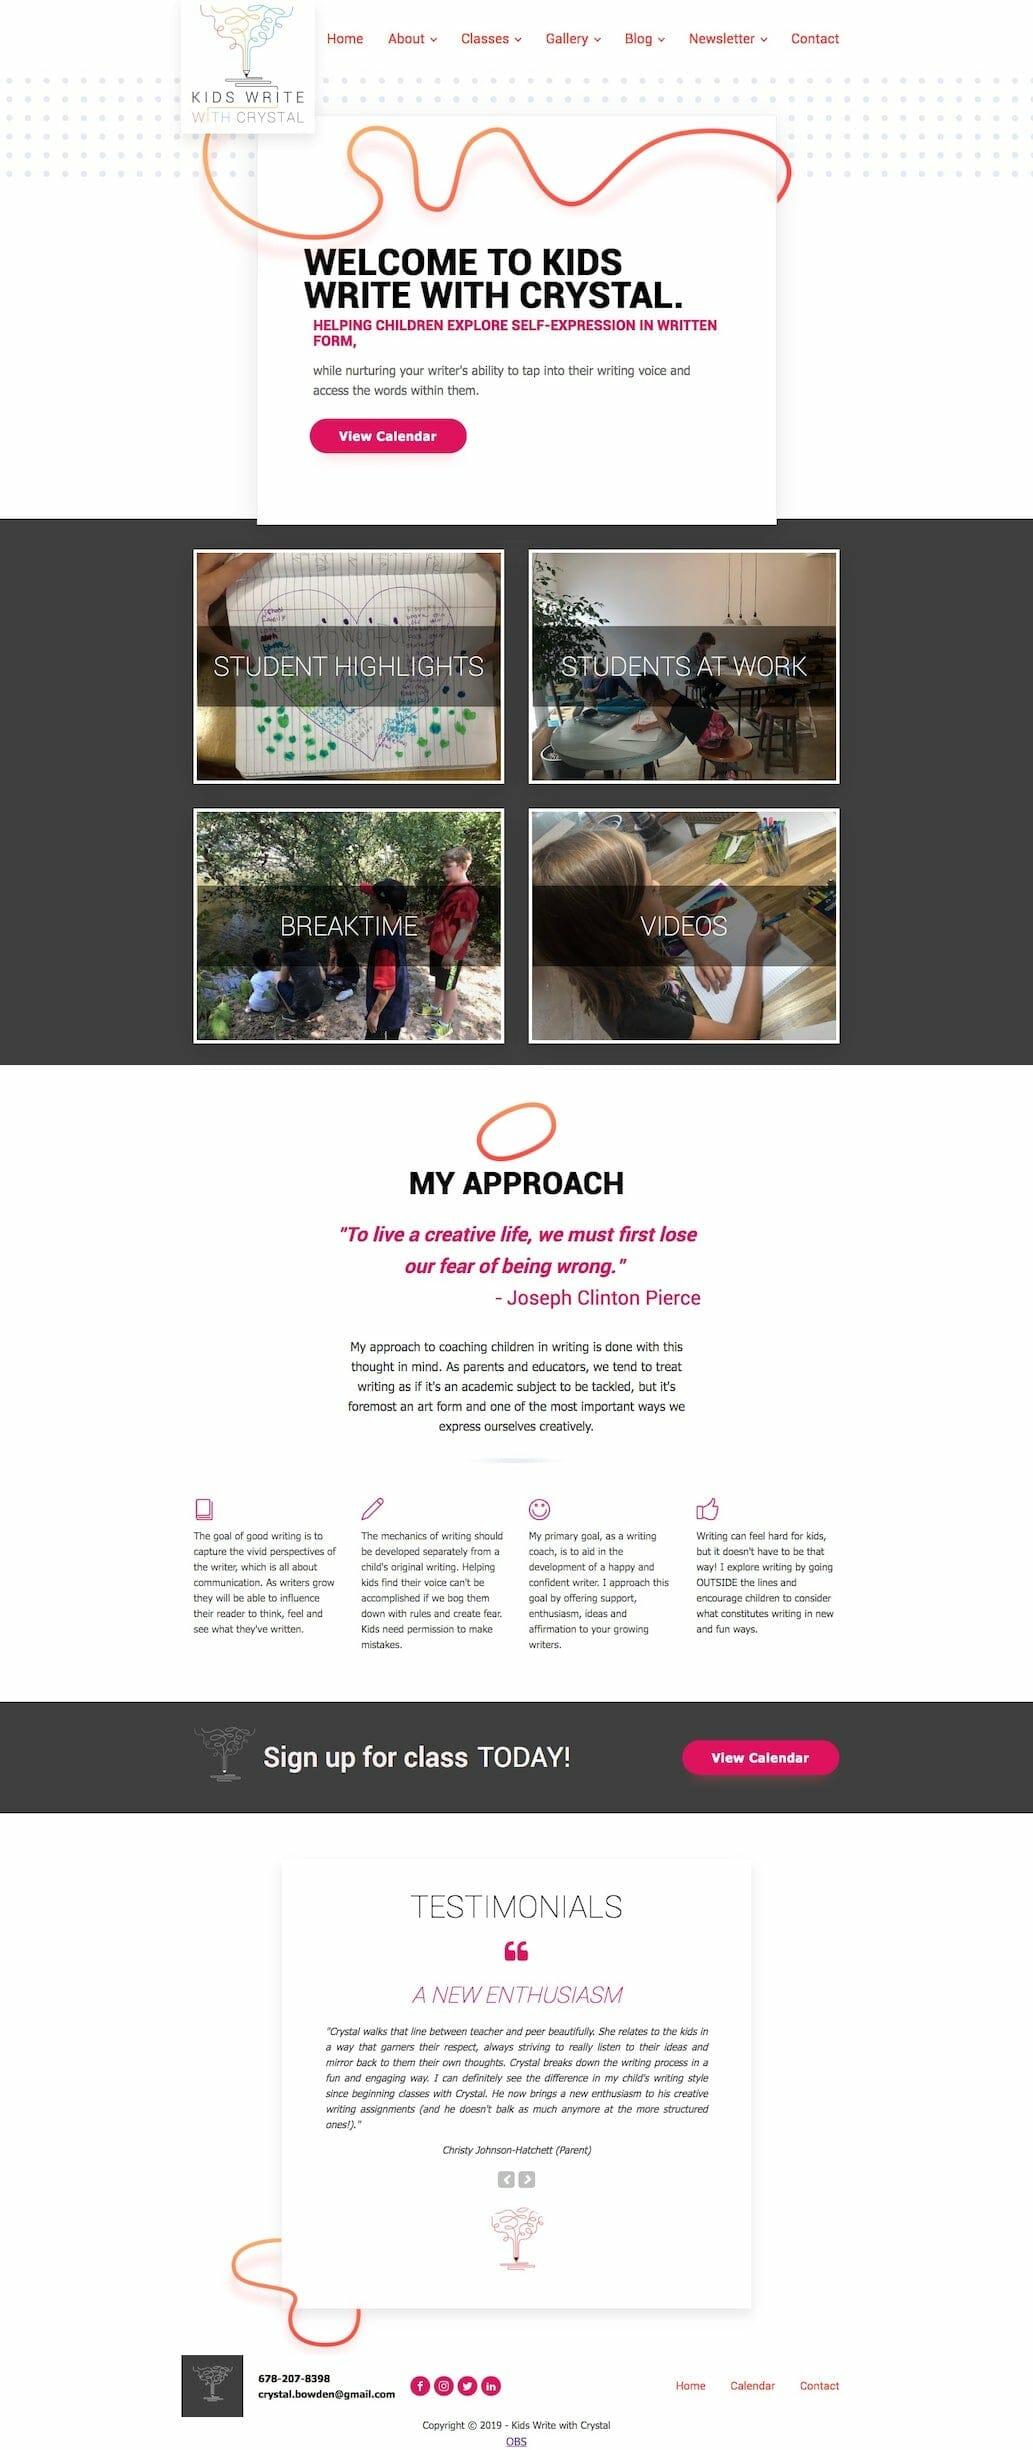 Kids Write with Crystal Homepage